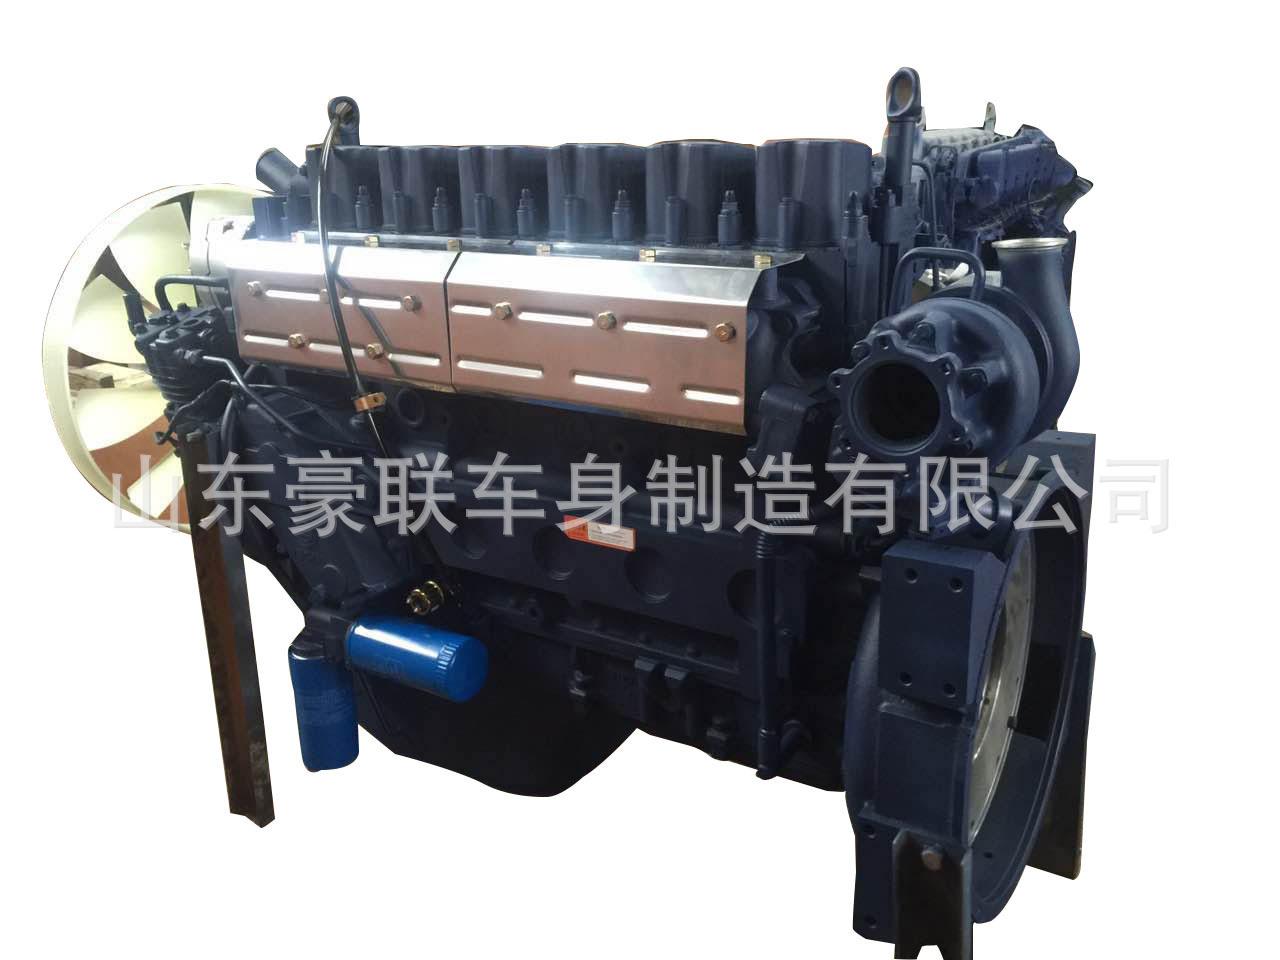 WD618潍柴发动机总成1.jpg